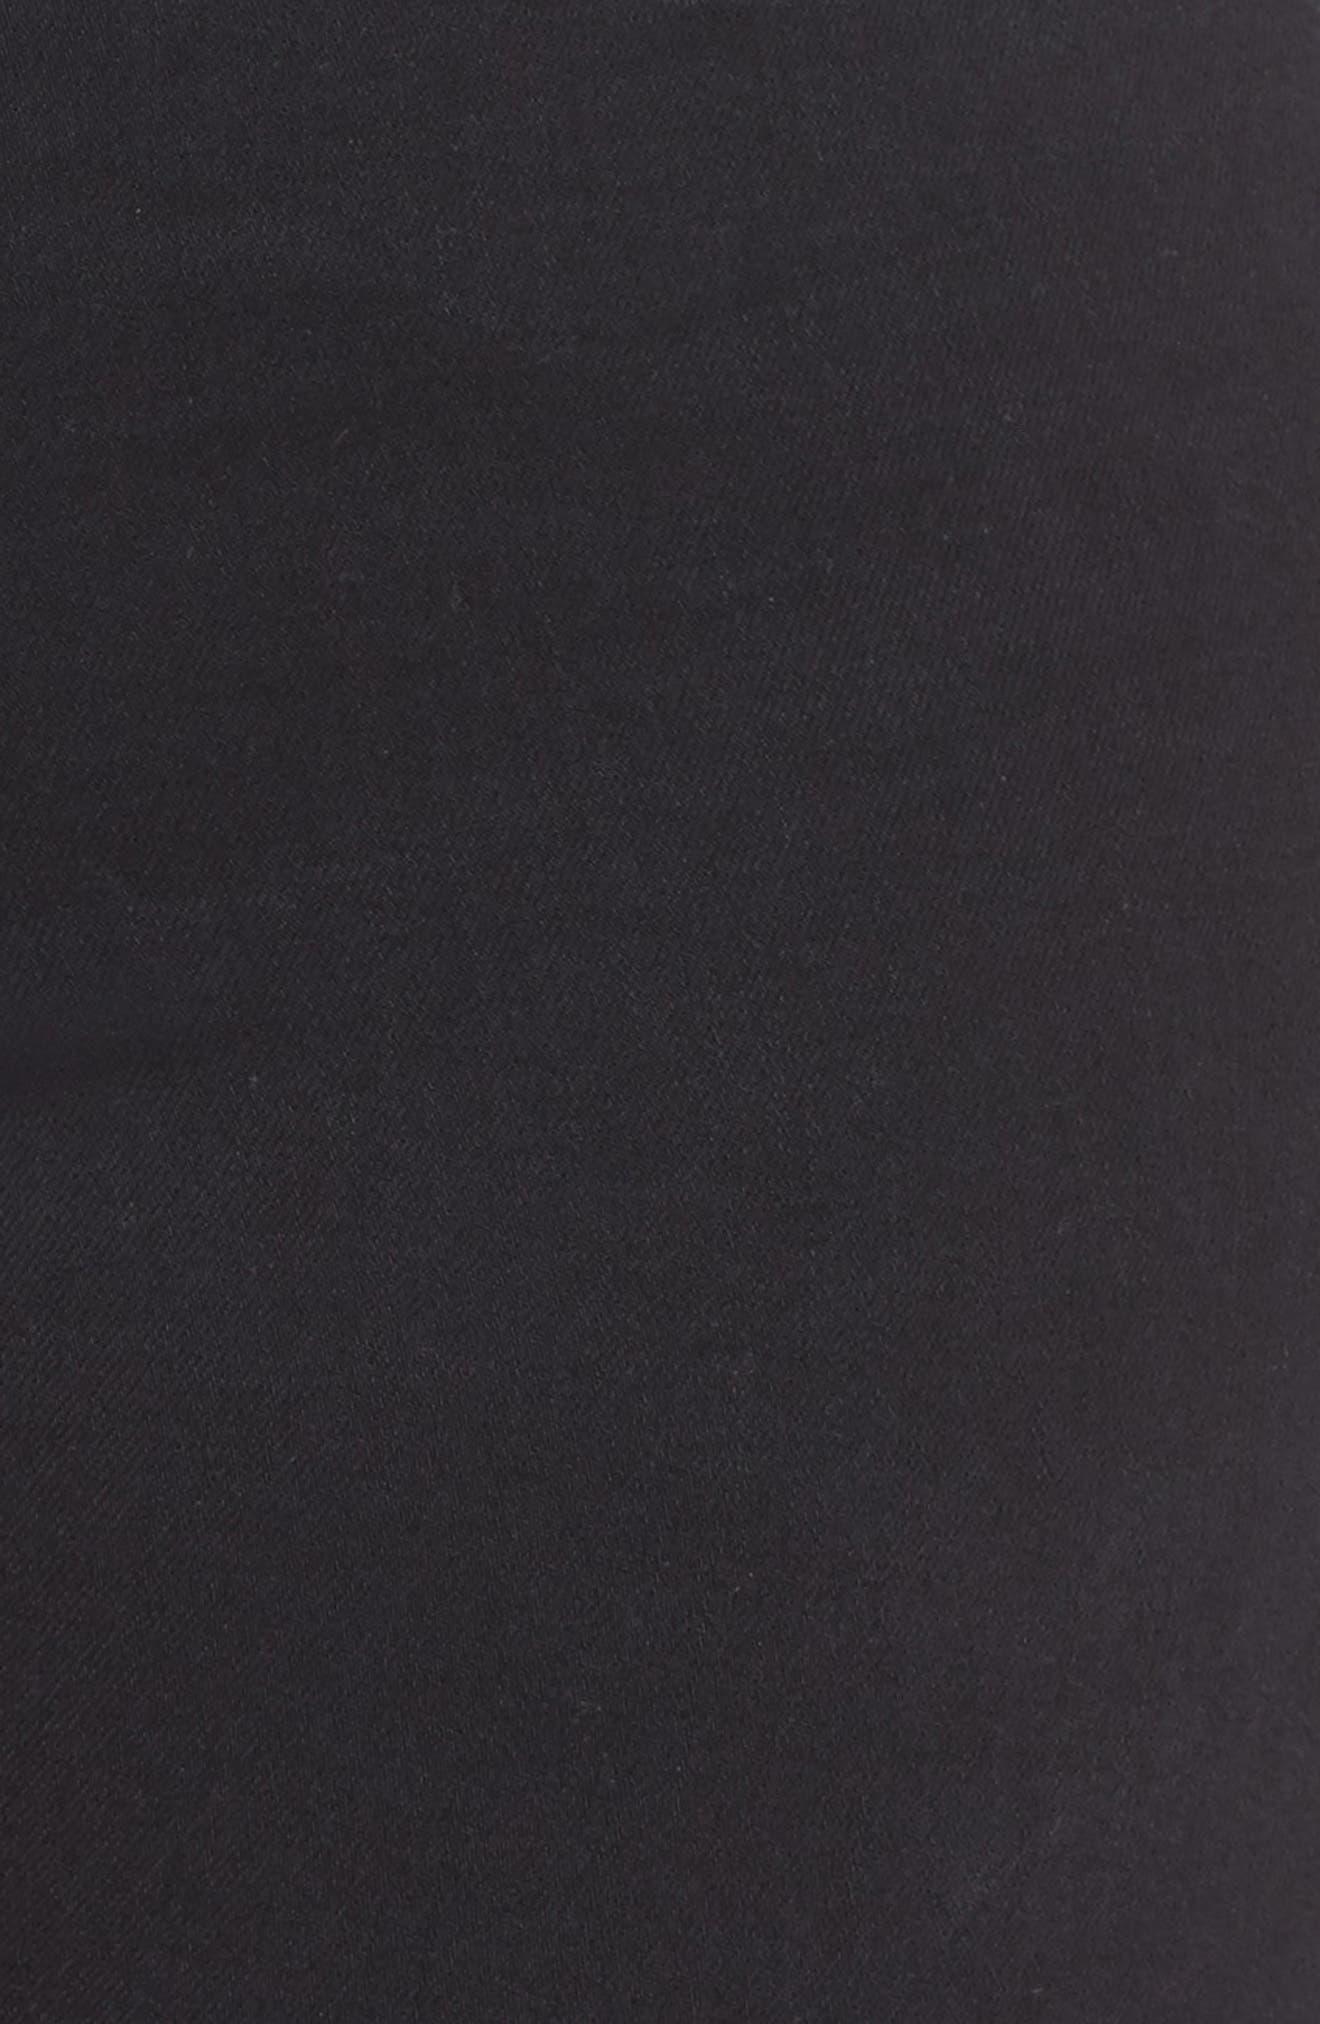 Good Waist High Rise Skinny Jeans,                             Alternate thumbnail 12, color,                             BLACK 004